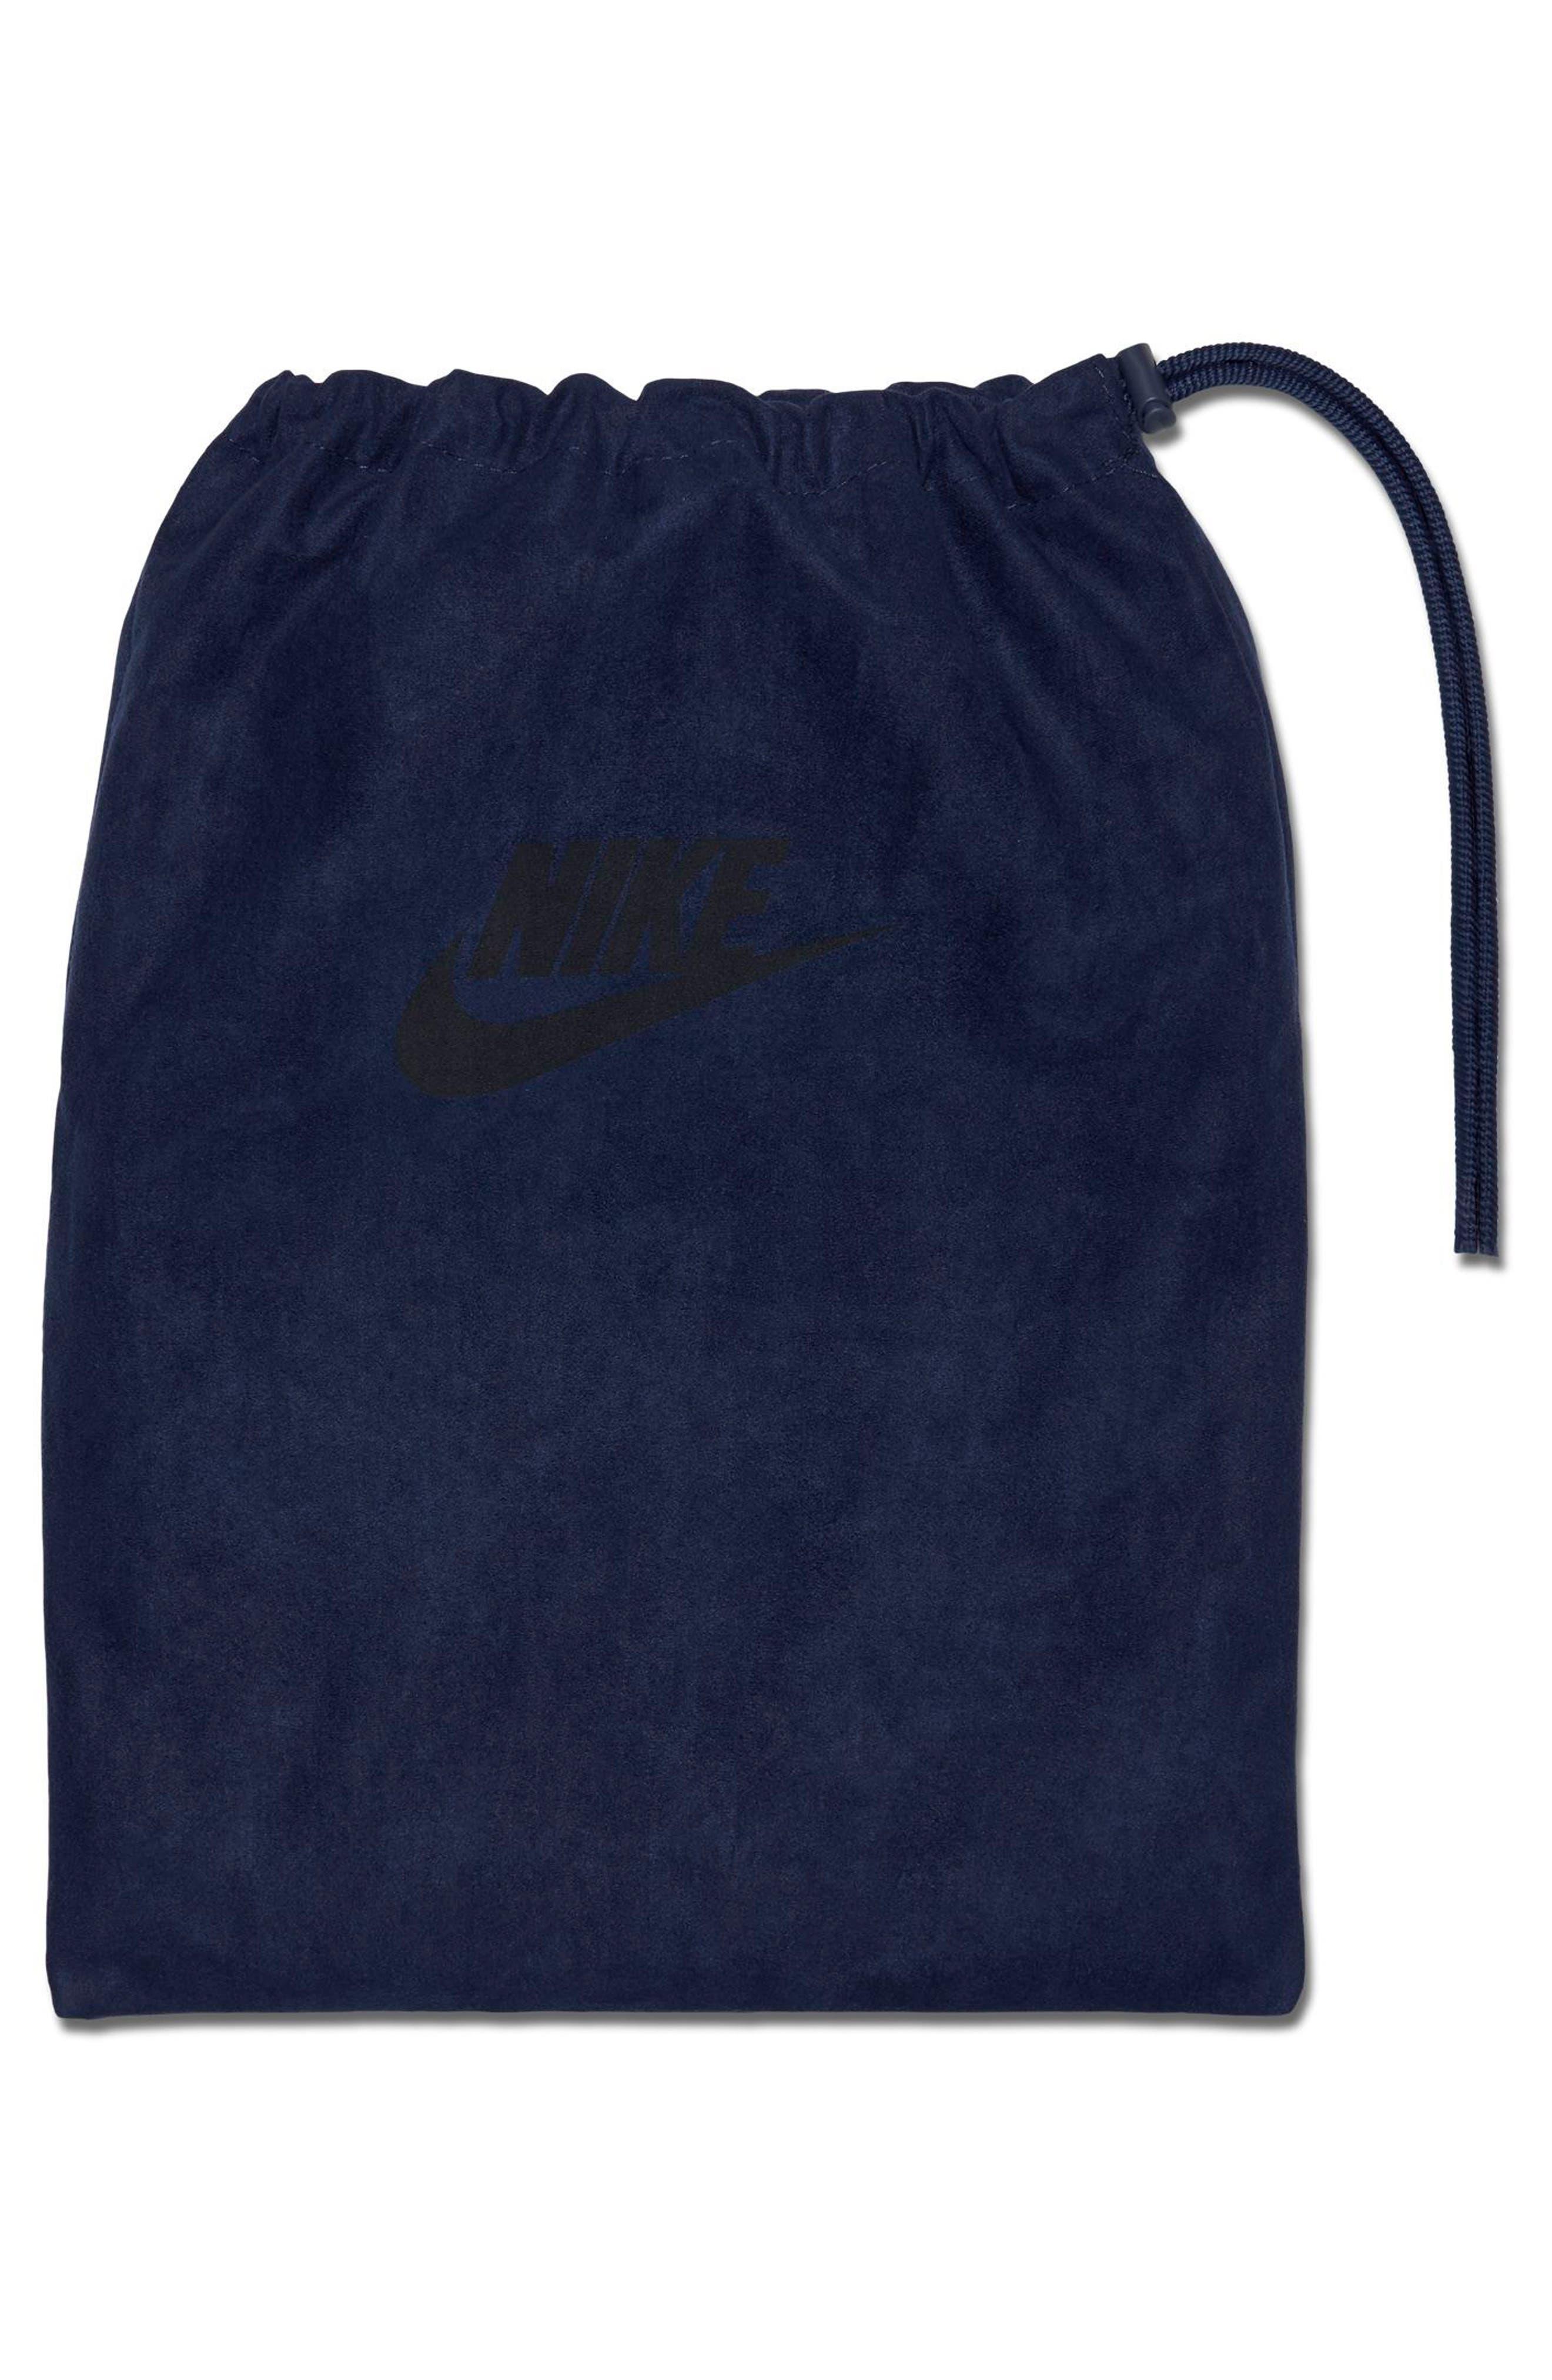 Blazer Mid Premium LX Sneaker,                             Alternate thumbnail 7, color,                             400